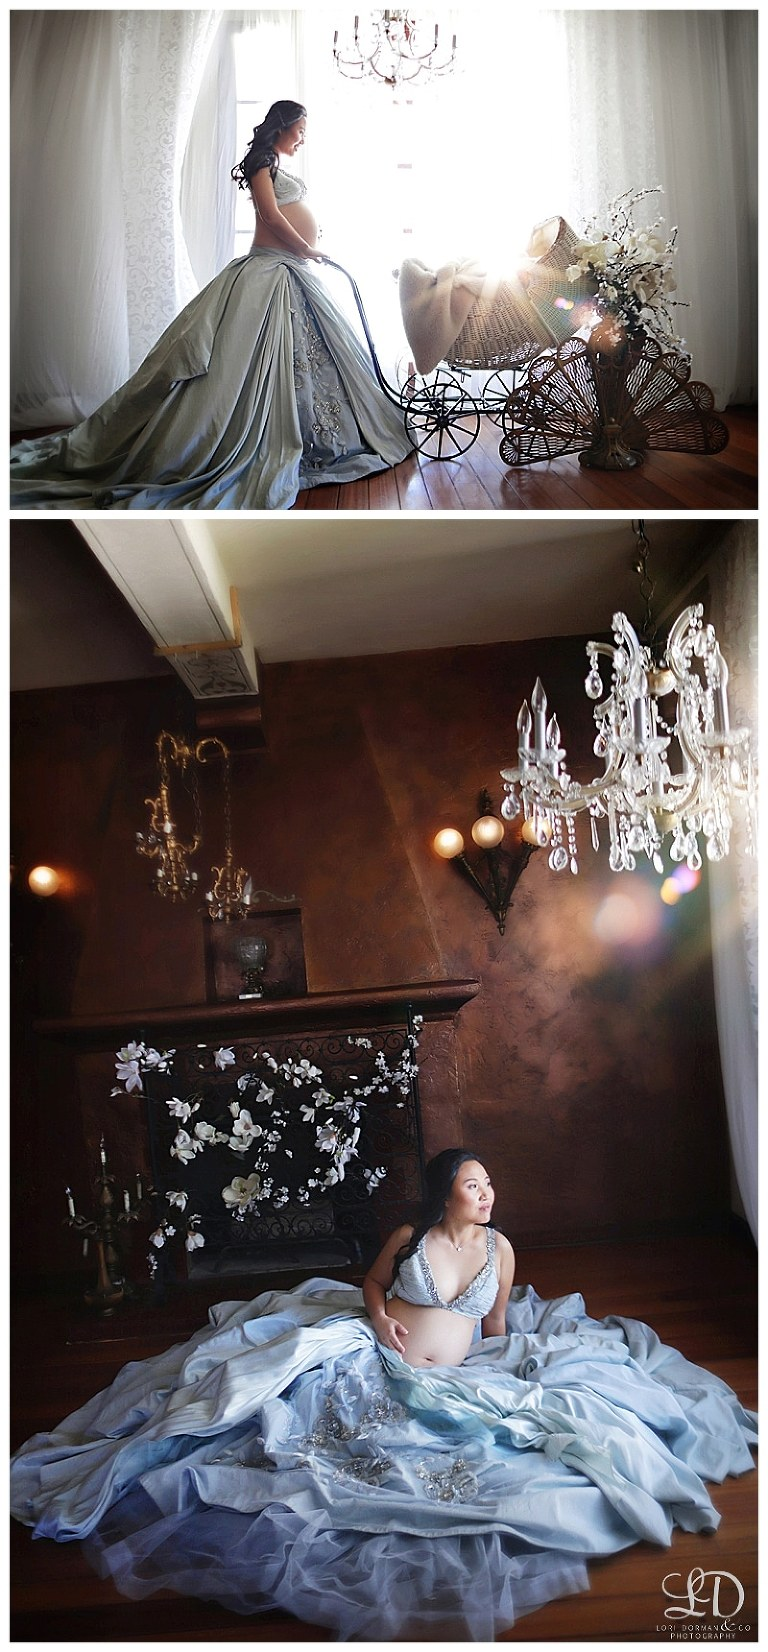 sweet maternity photoshoot-lori dorman photography-maternity boudoir-professional photographer_5617.jpg